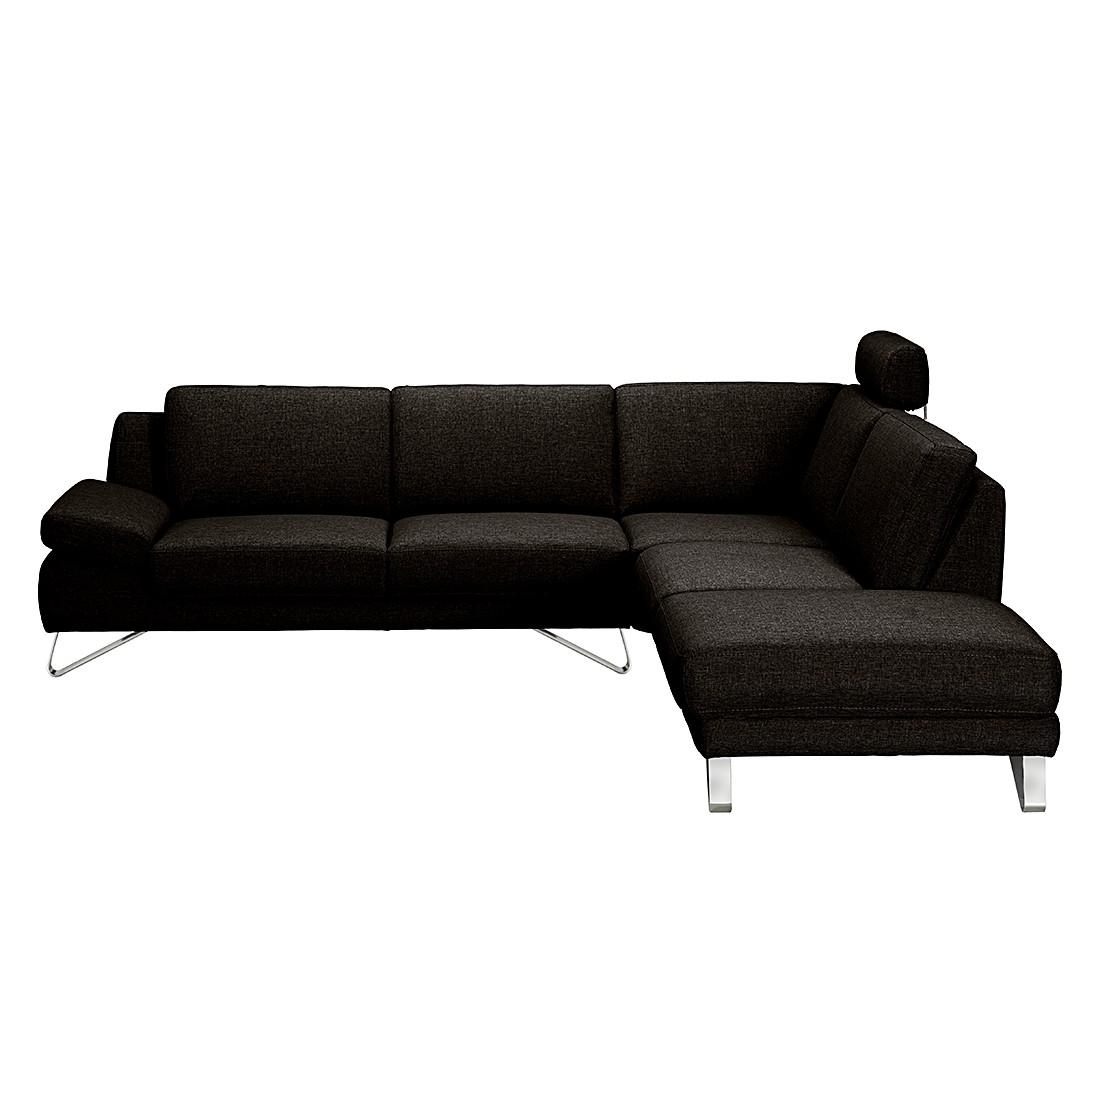 Canapé d'angle Silvano I